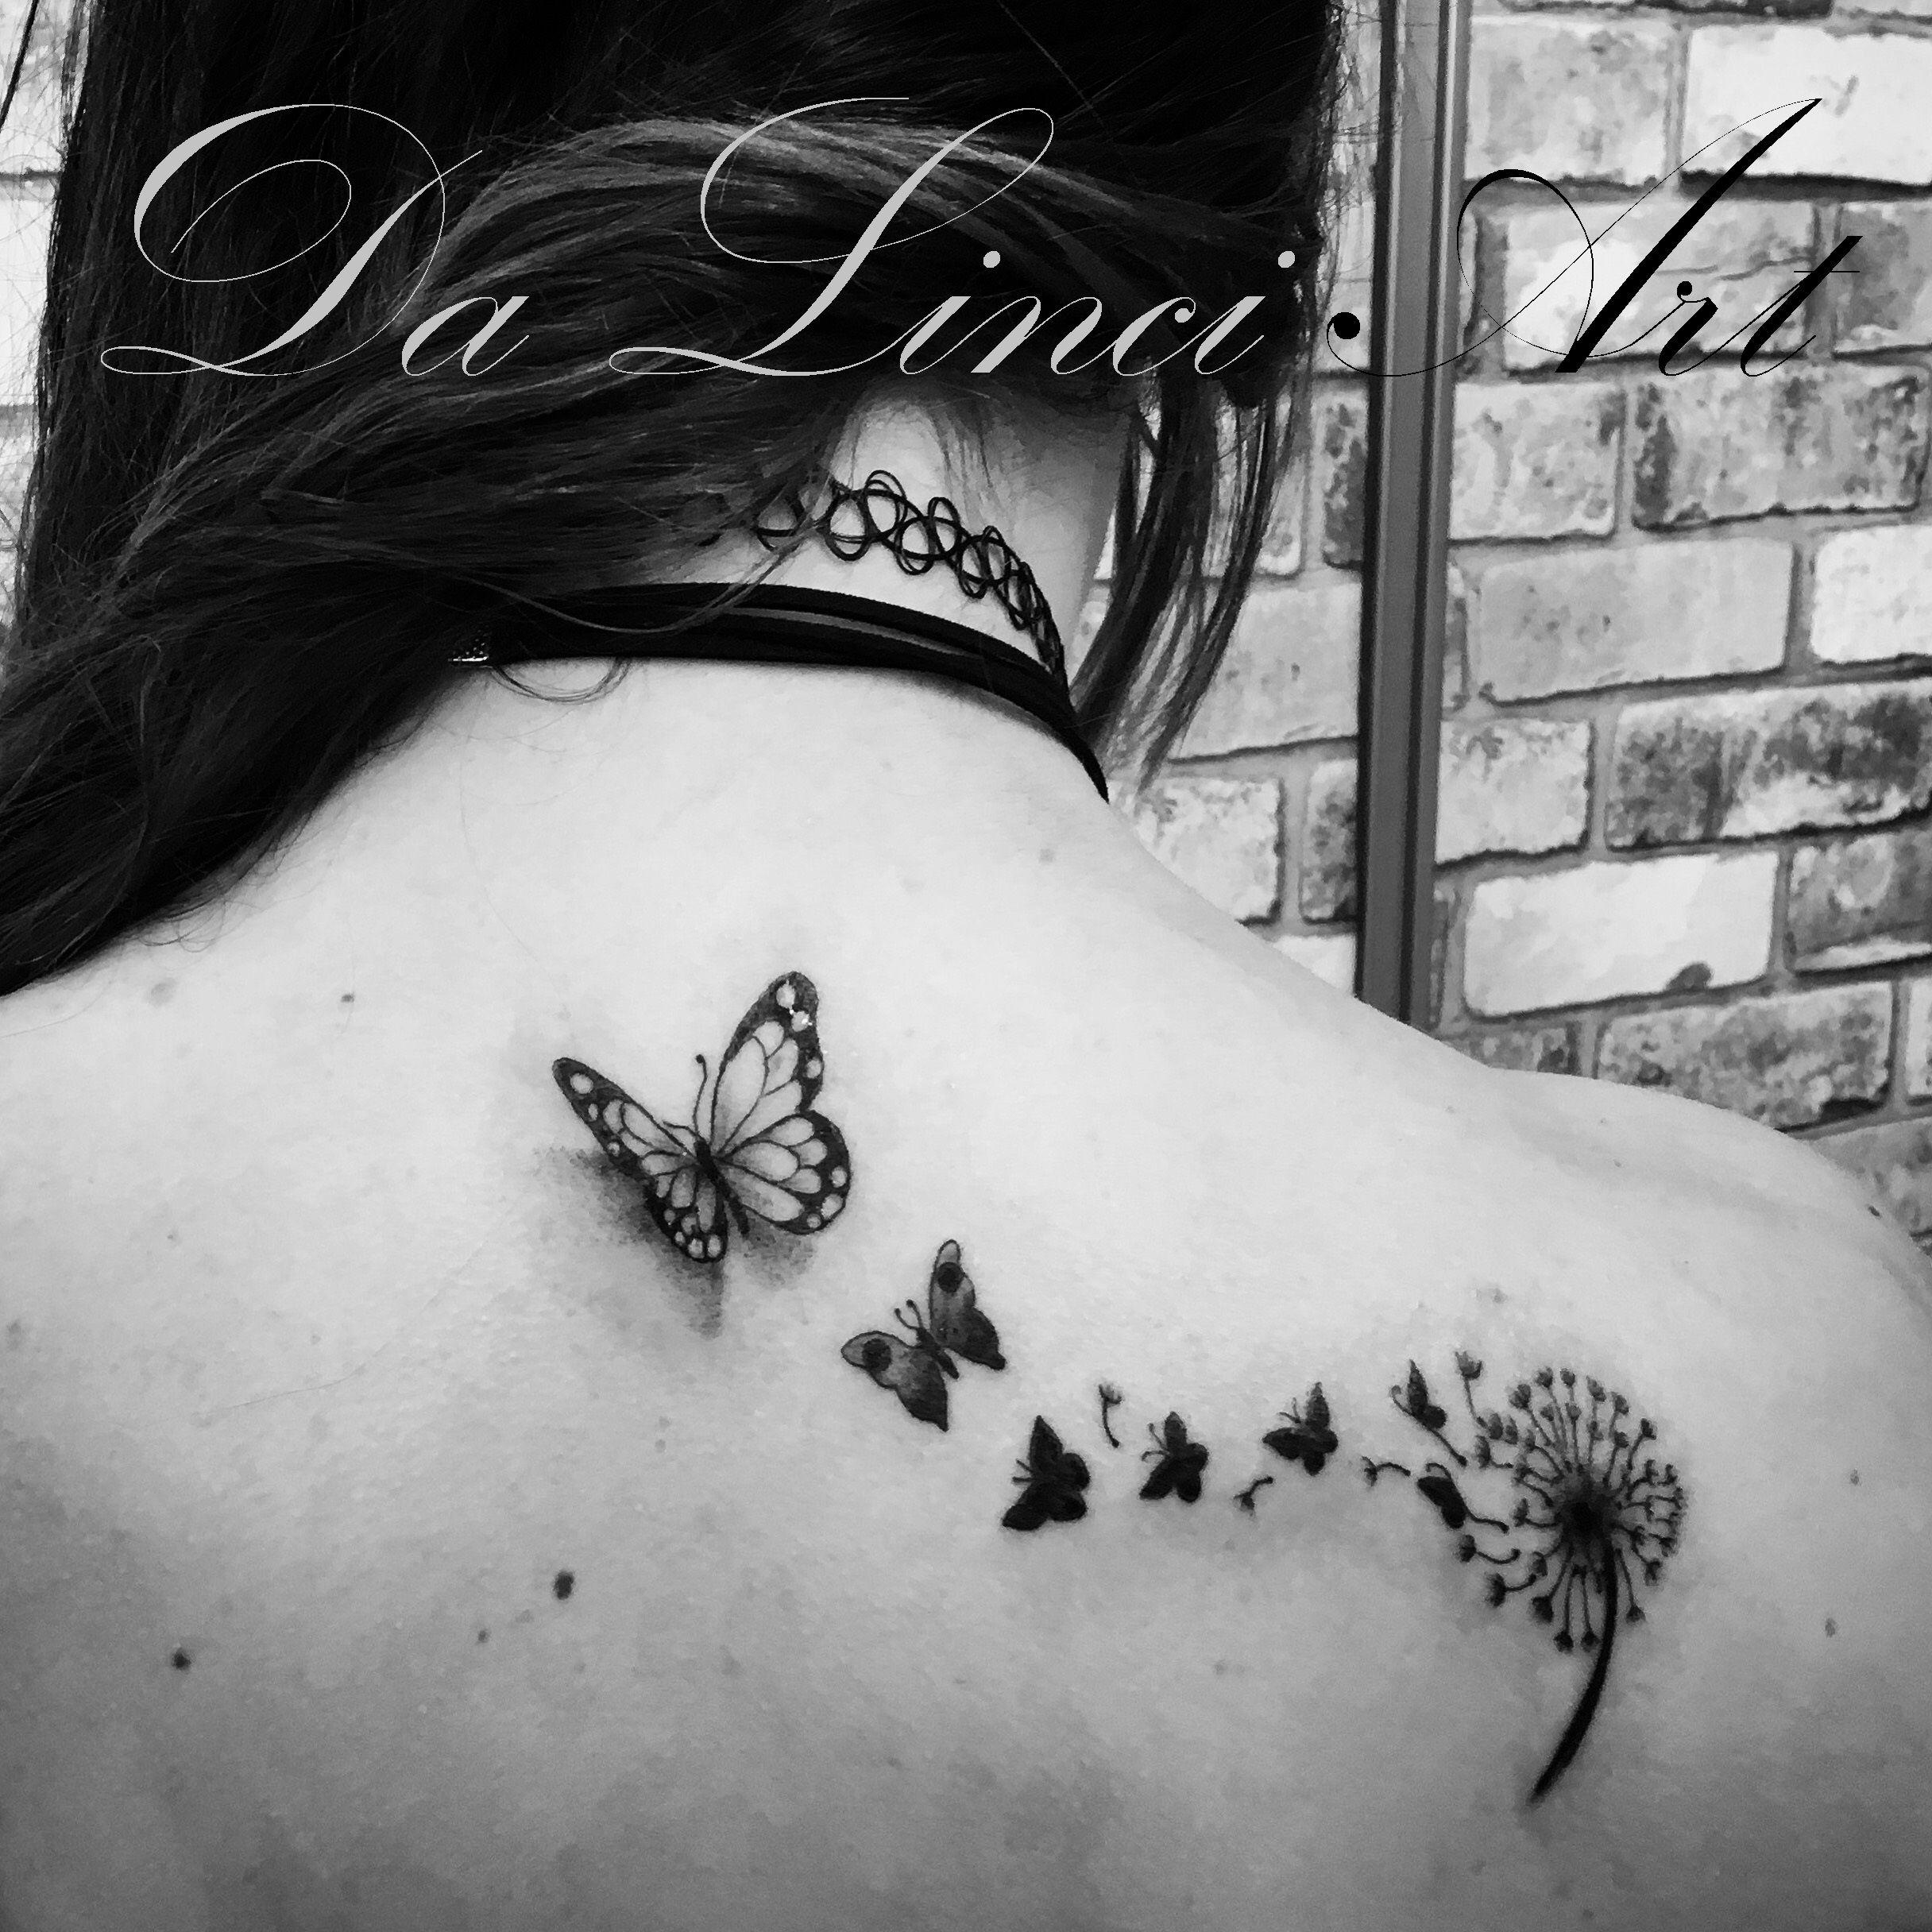 Dandelion Butterfly Tattoo Made By Linda Roos Da Linci Art Zwijndrecht The Netherlands Www Dalinciart Nl Butterflys Dandelion Tattoo Mom Tattoos Tattoos